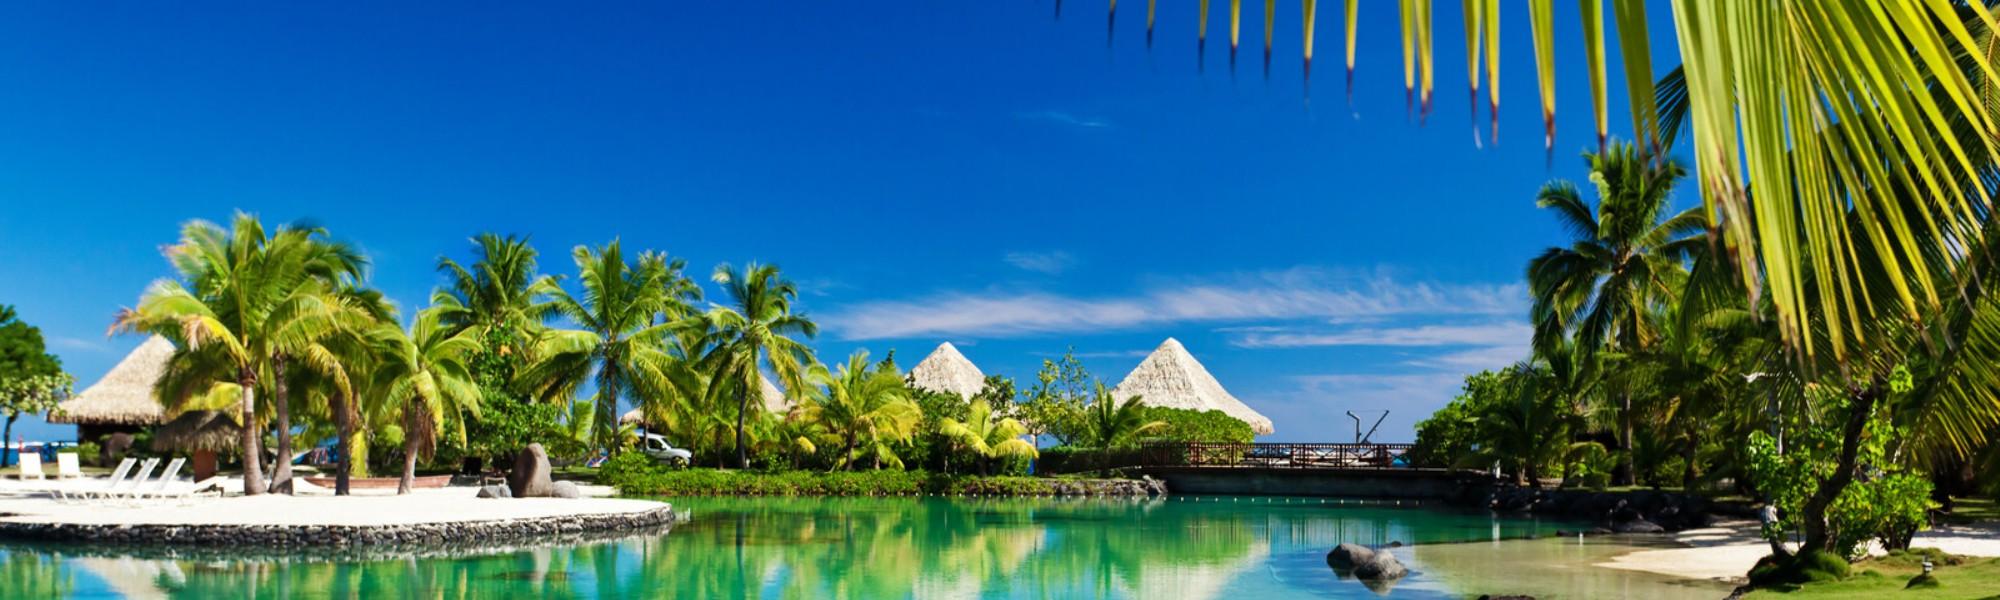 1 tropical resort_canstockphoto8750212